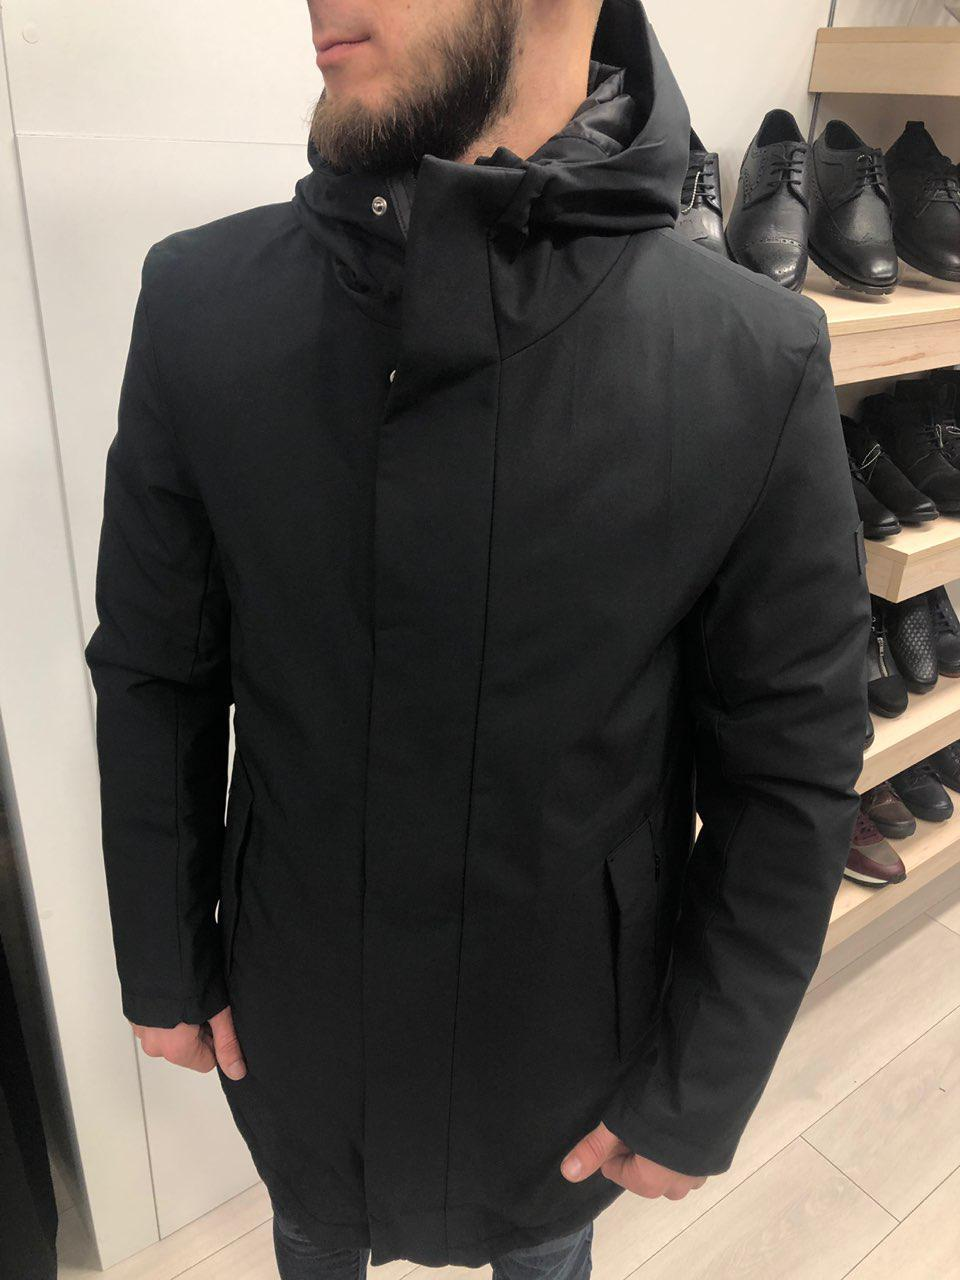 Мужская зимняя парка с капюшоном черная